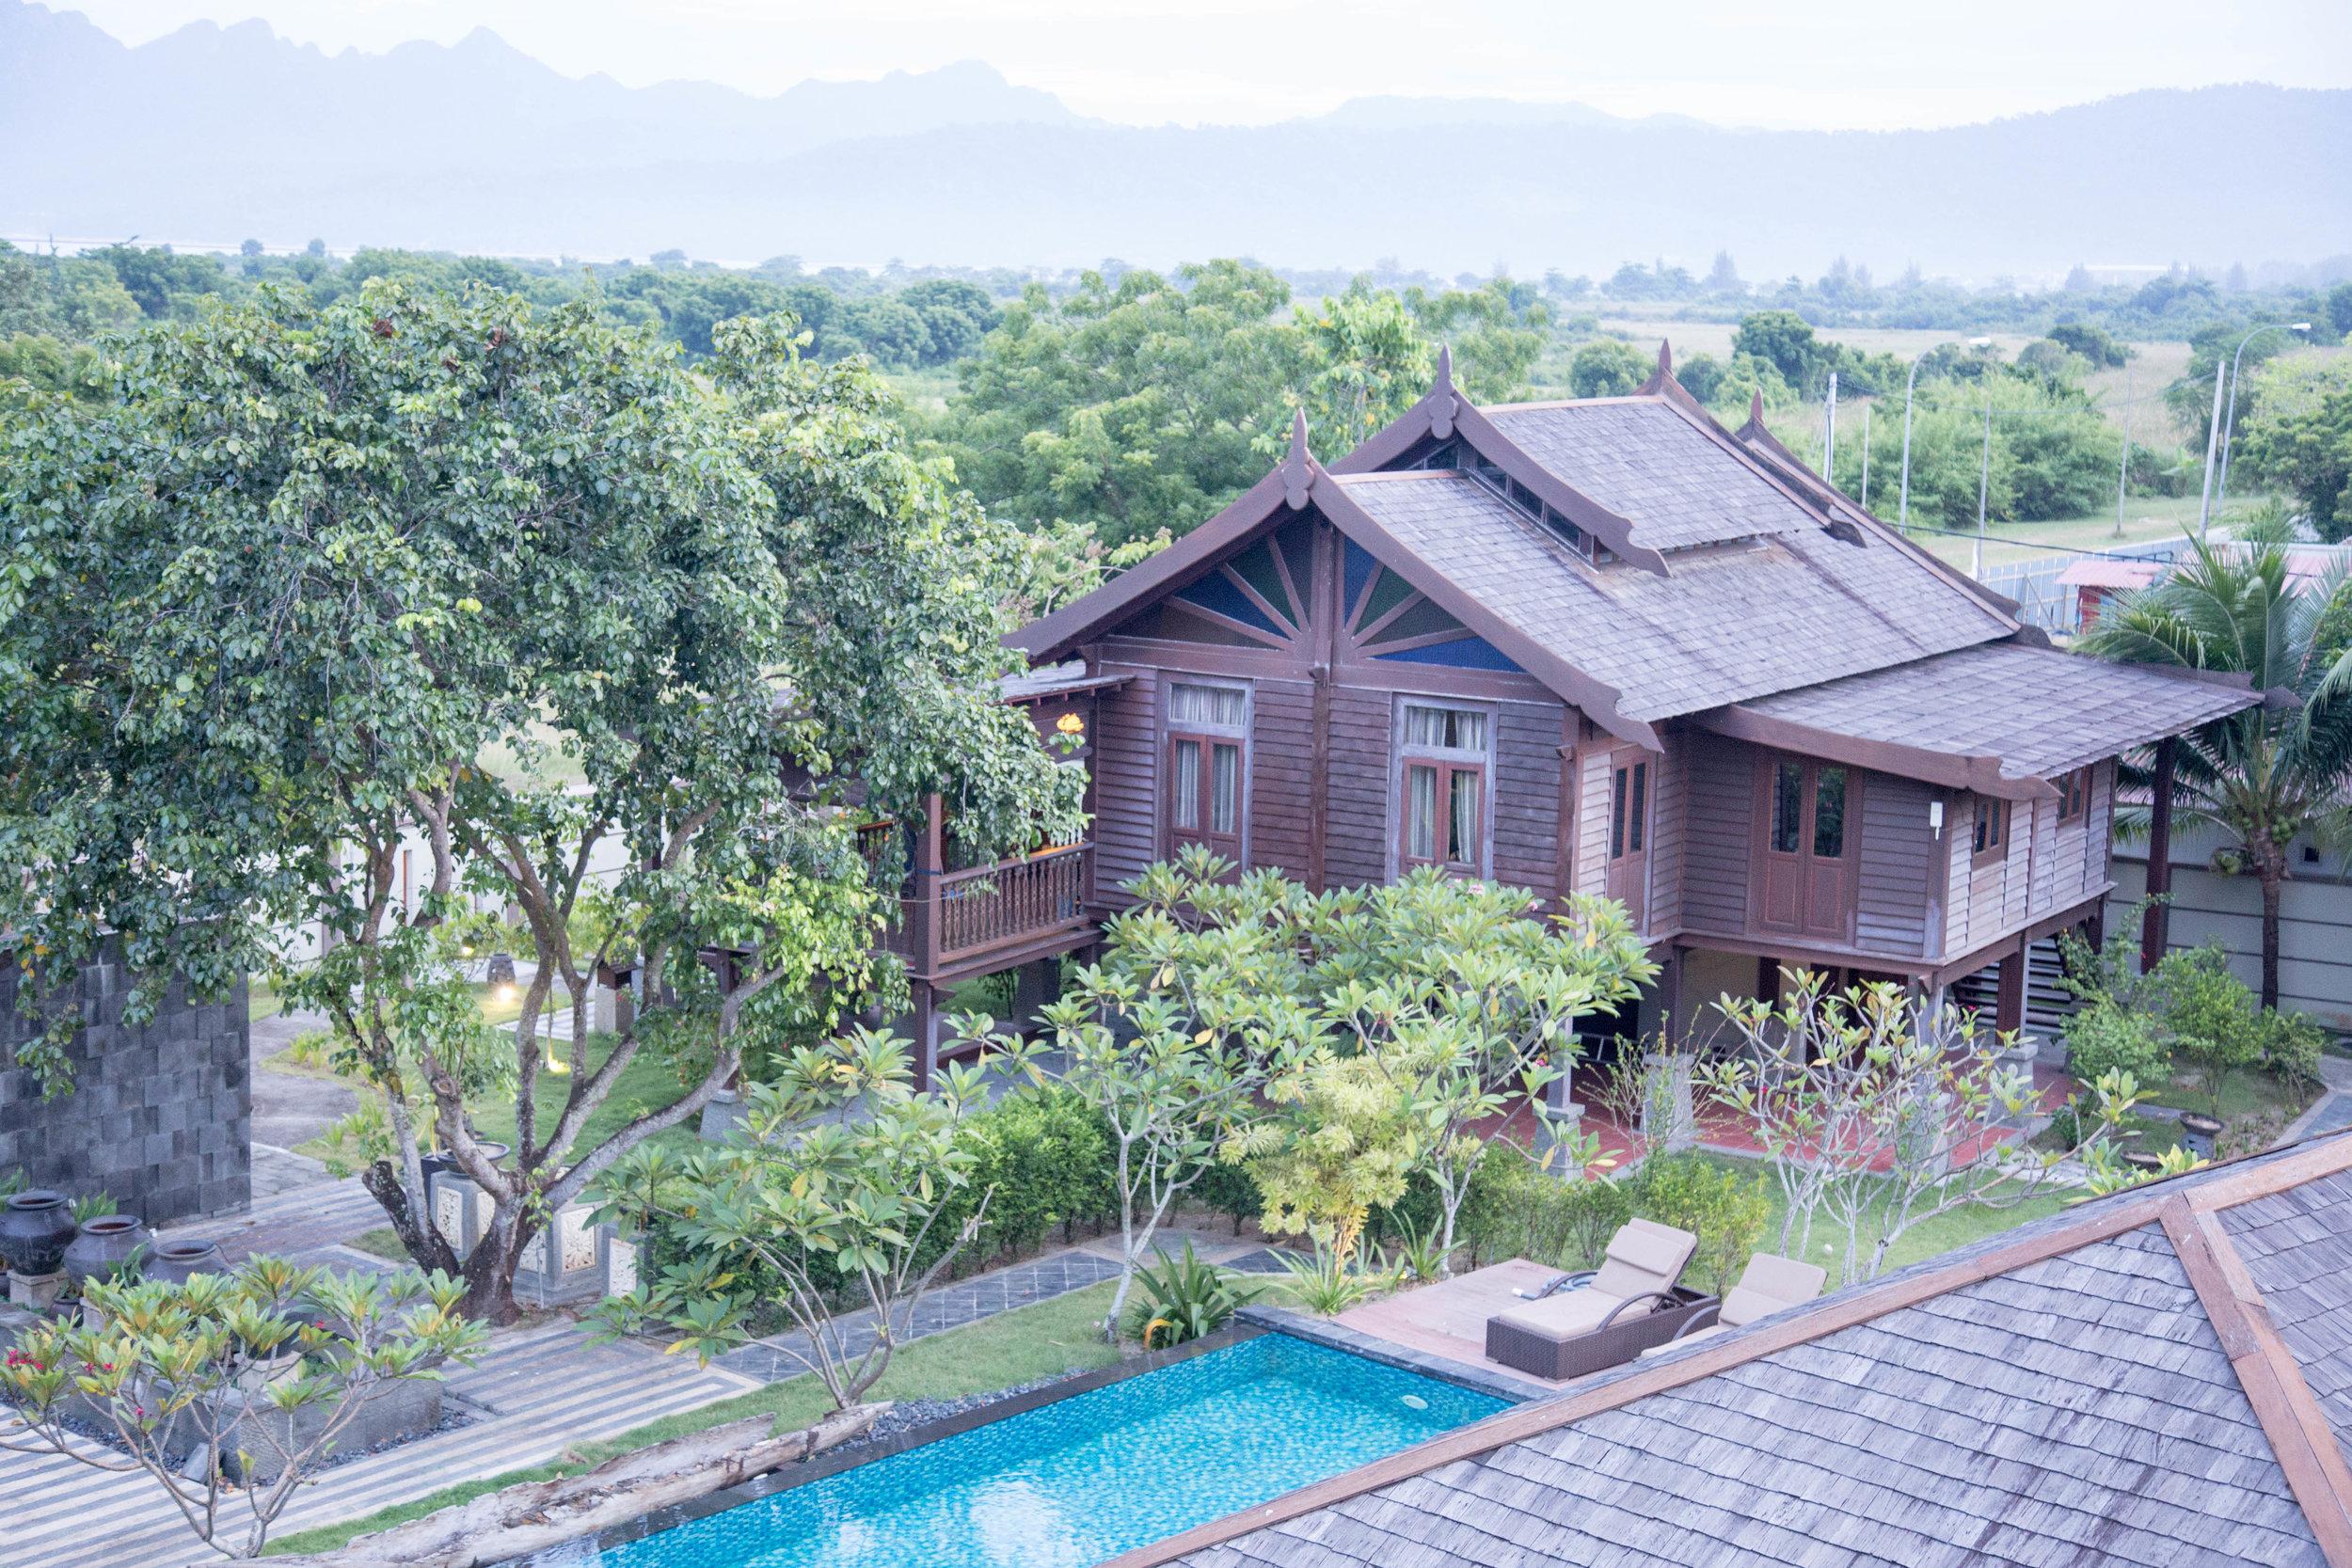 Rumah Trengganu: Our residence for 3 weeks!